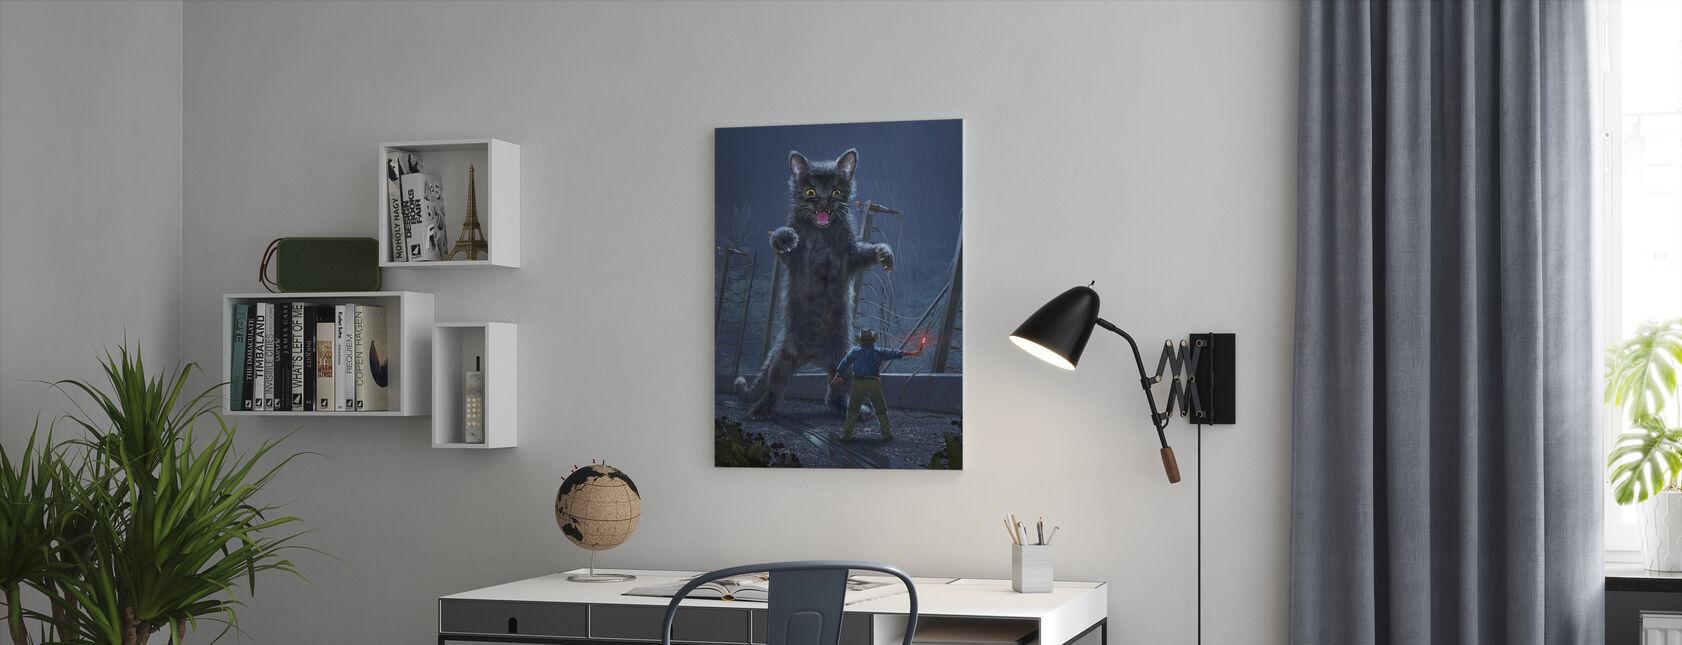 Jurassic Kitty - Billede på lærred - Kontor